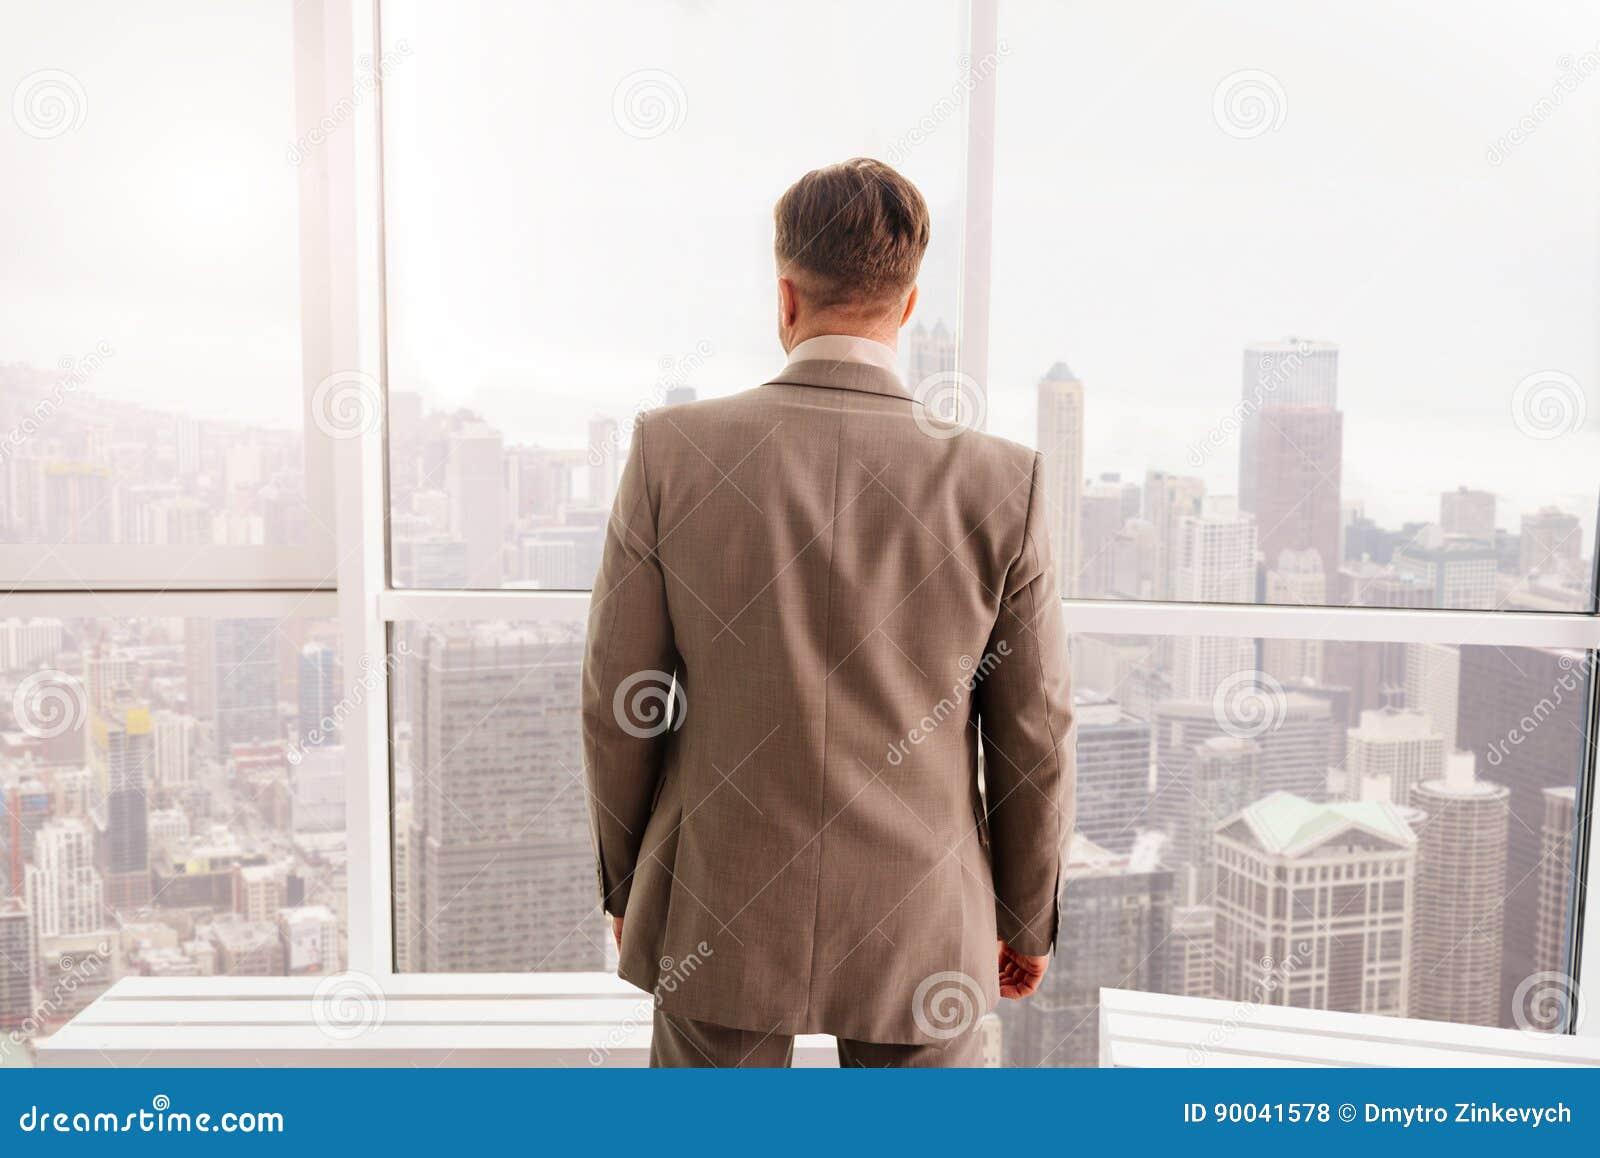 Rear view of businessman standing near window